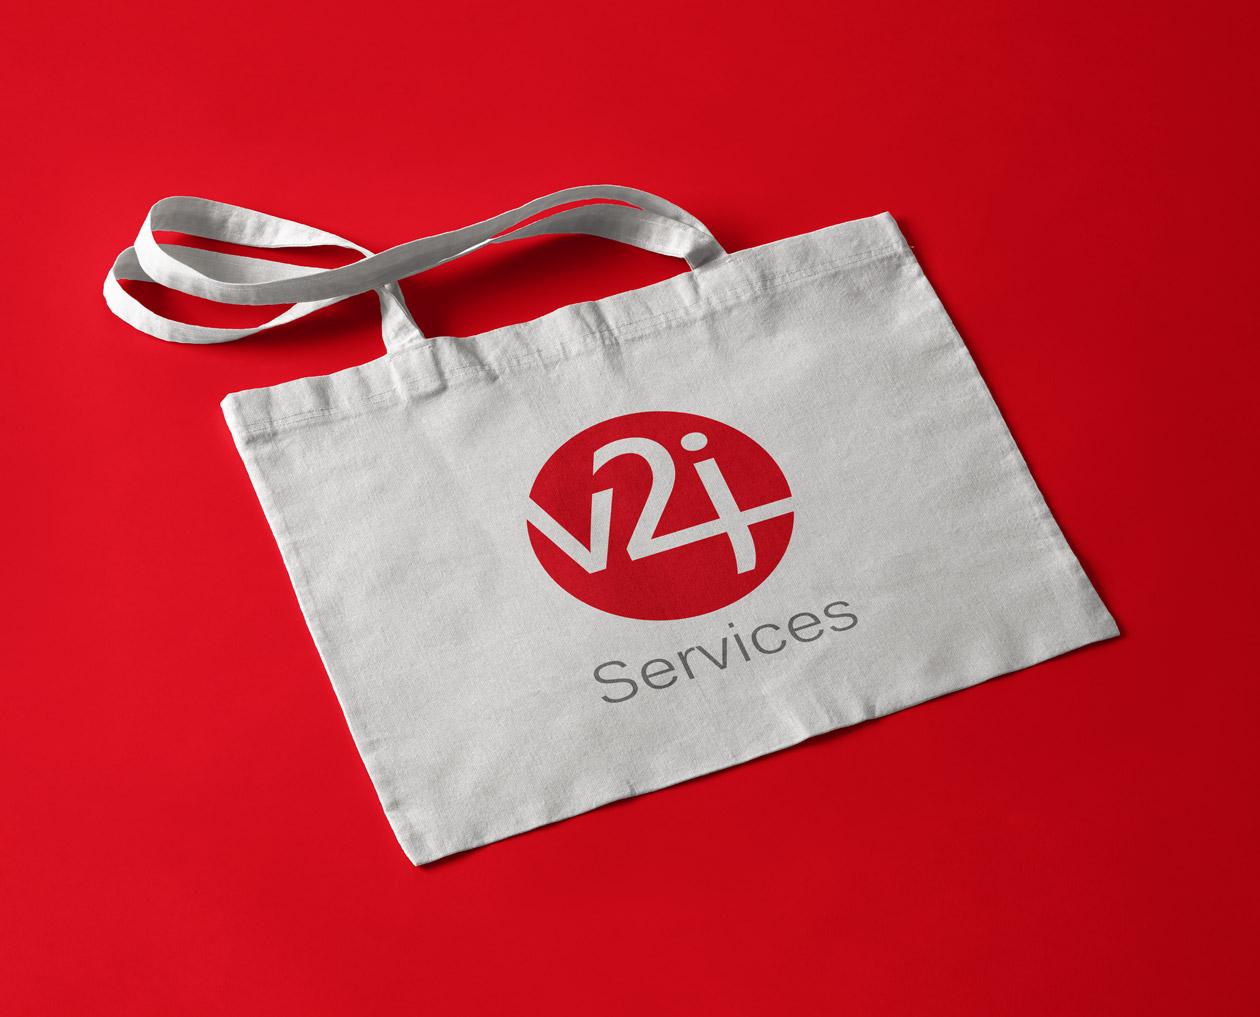 logo design v2j services 07